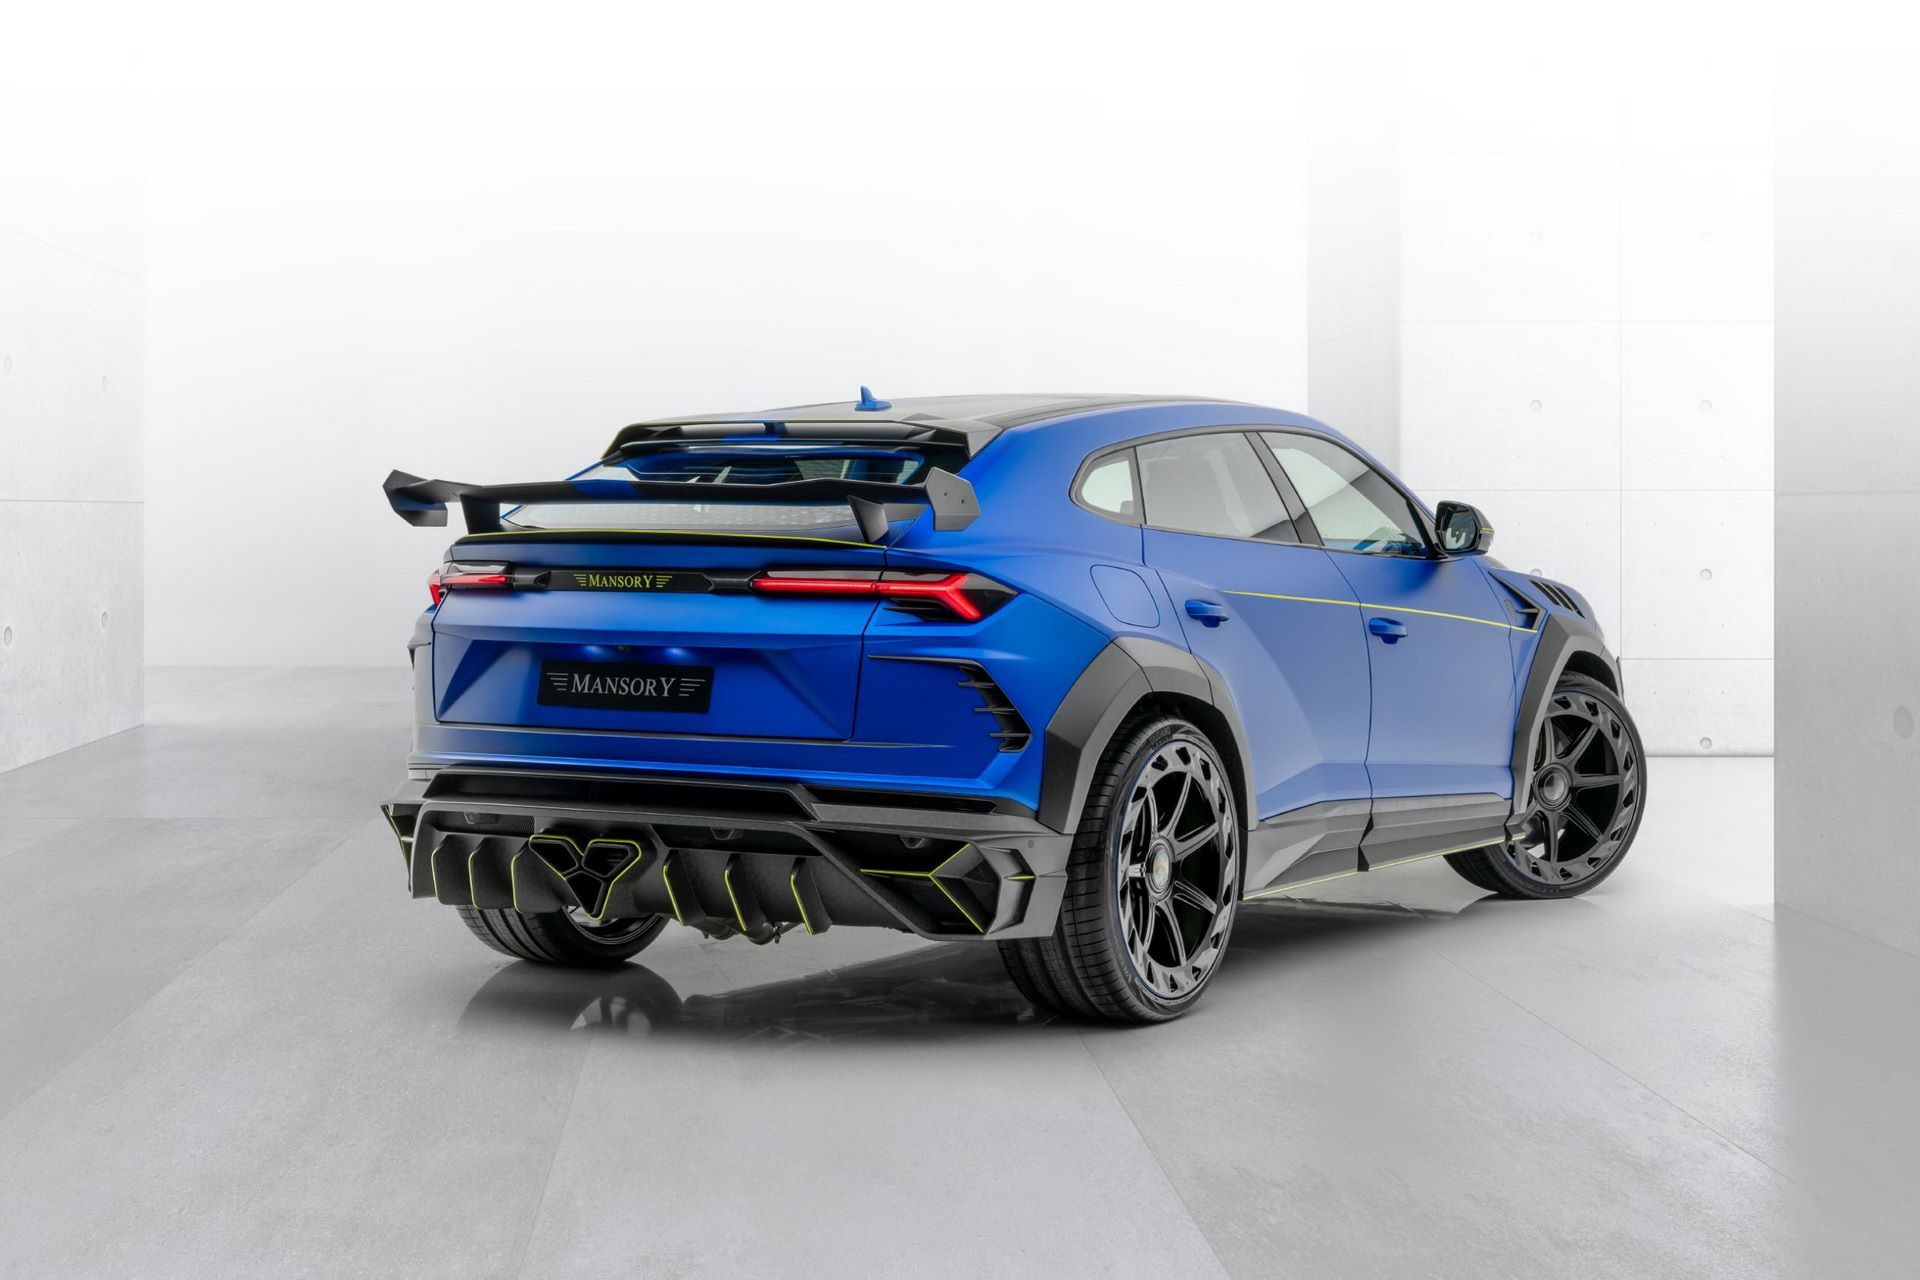 Lamborghini-Urus-Mansory-Venatus-2